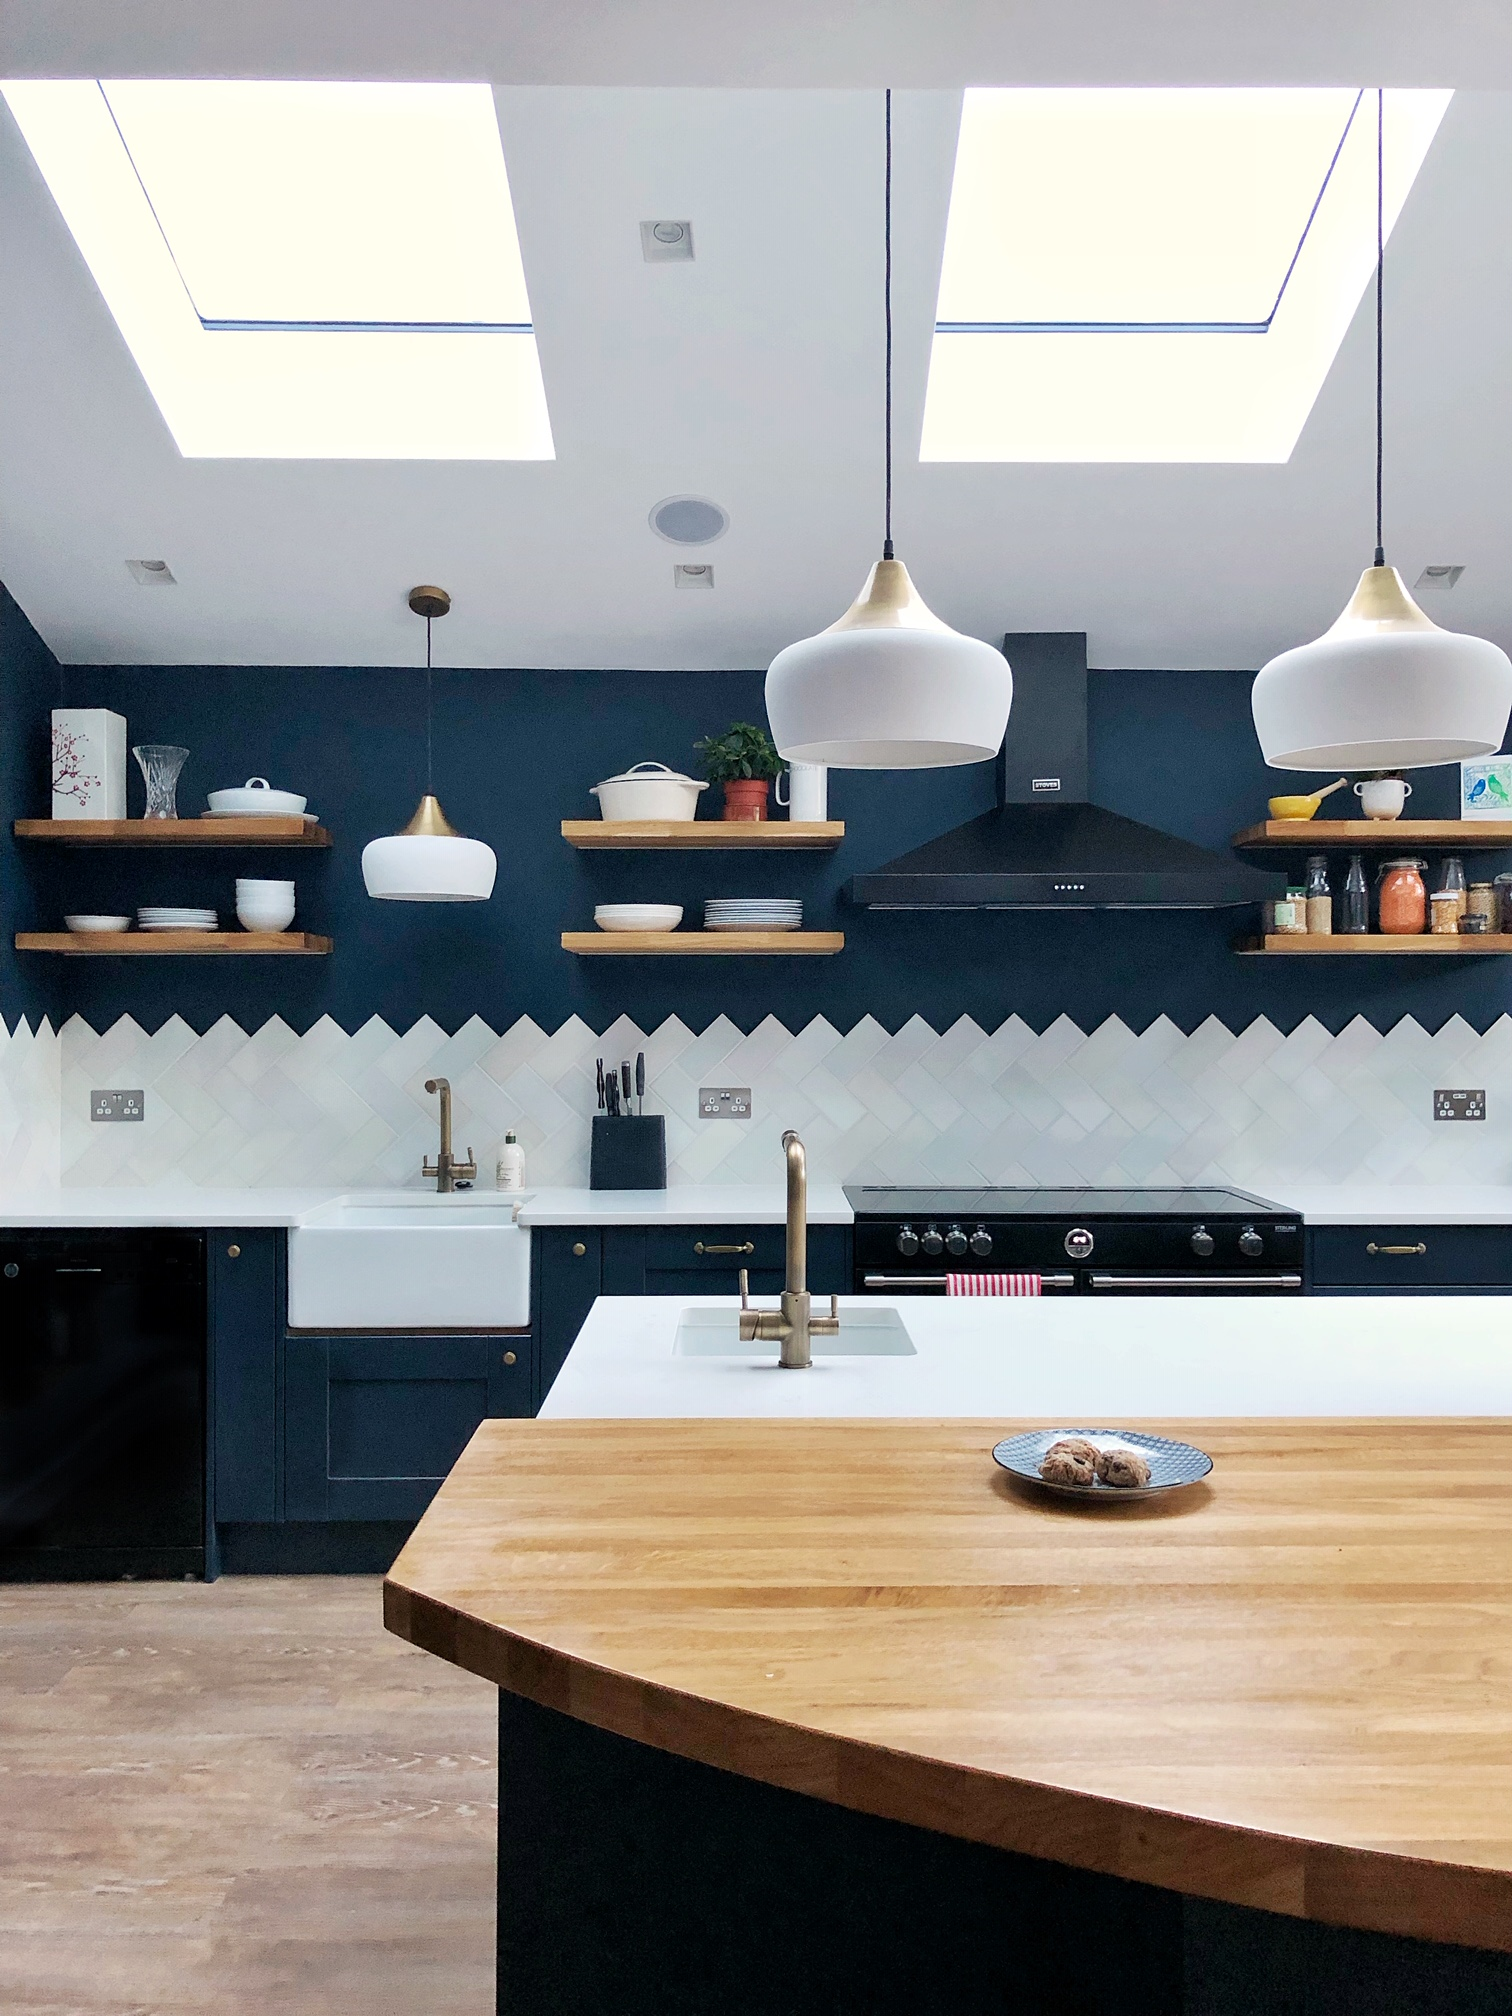 London kitchen for hire. Blue kitchen. Renovation inspiration.